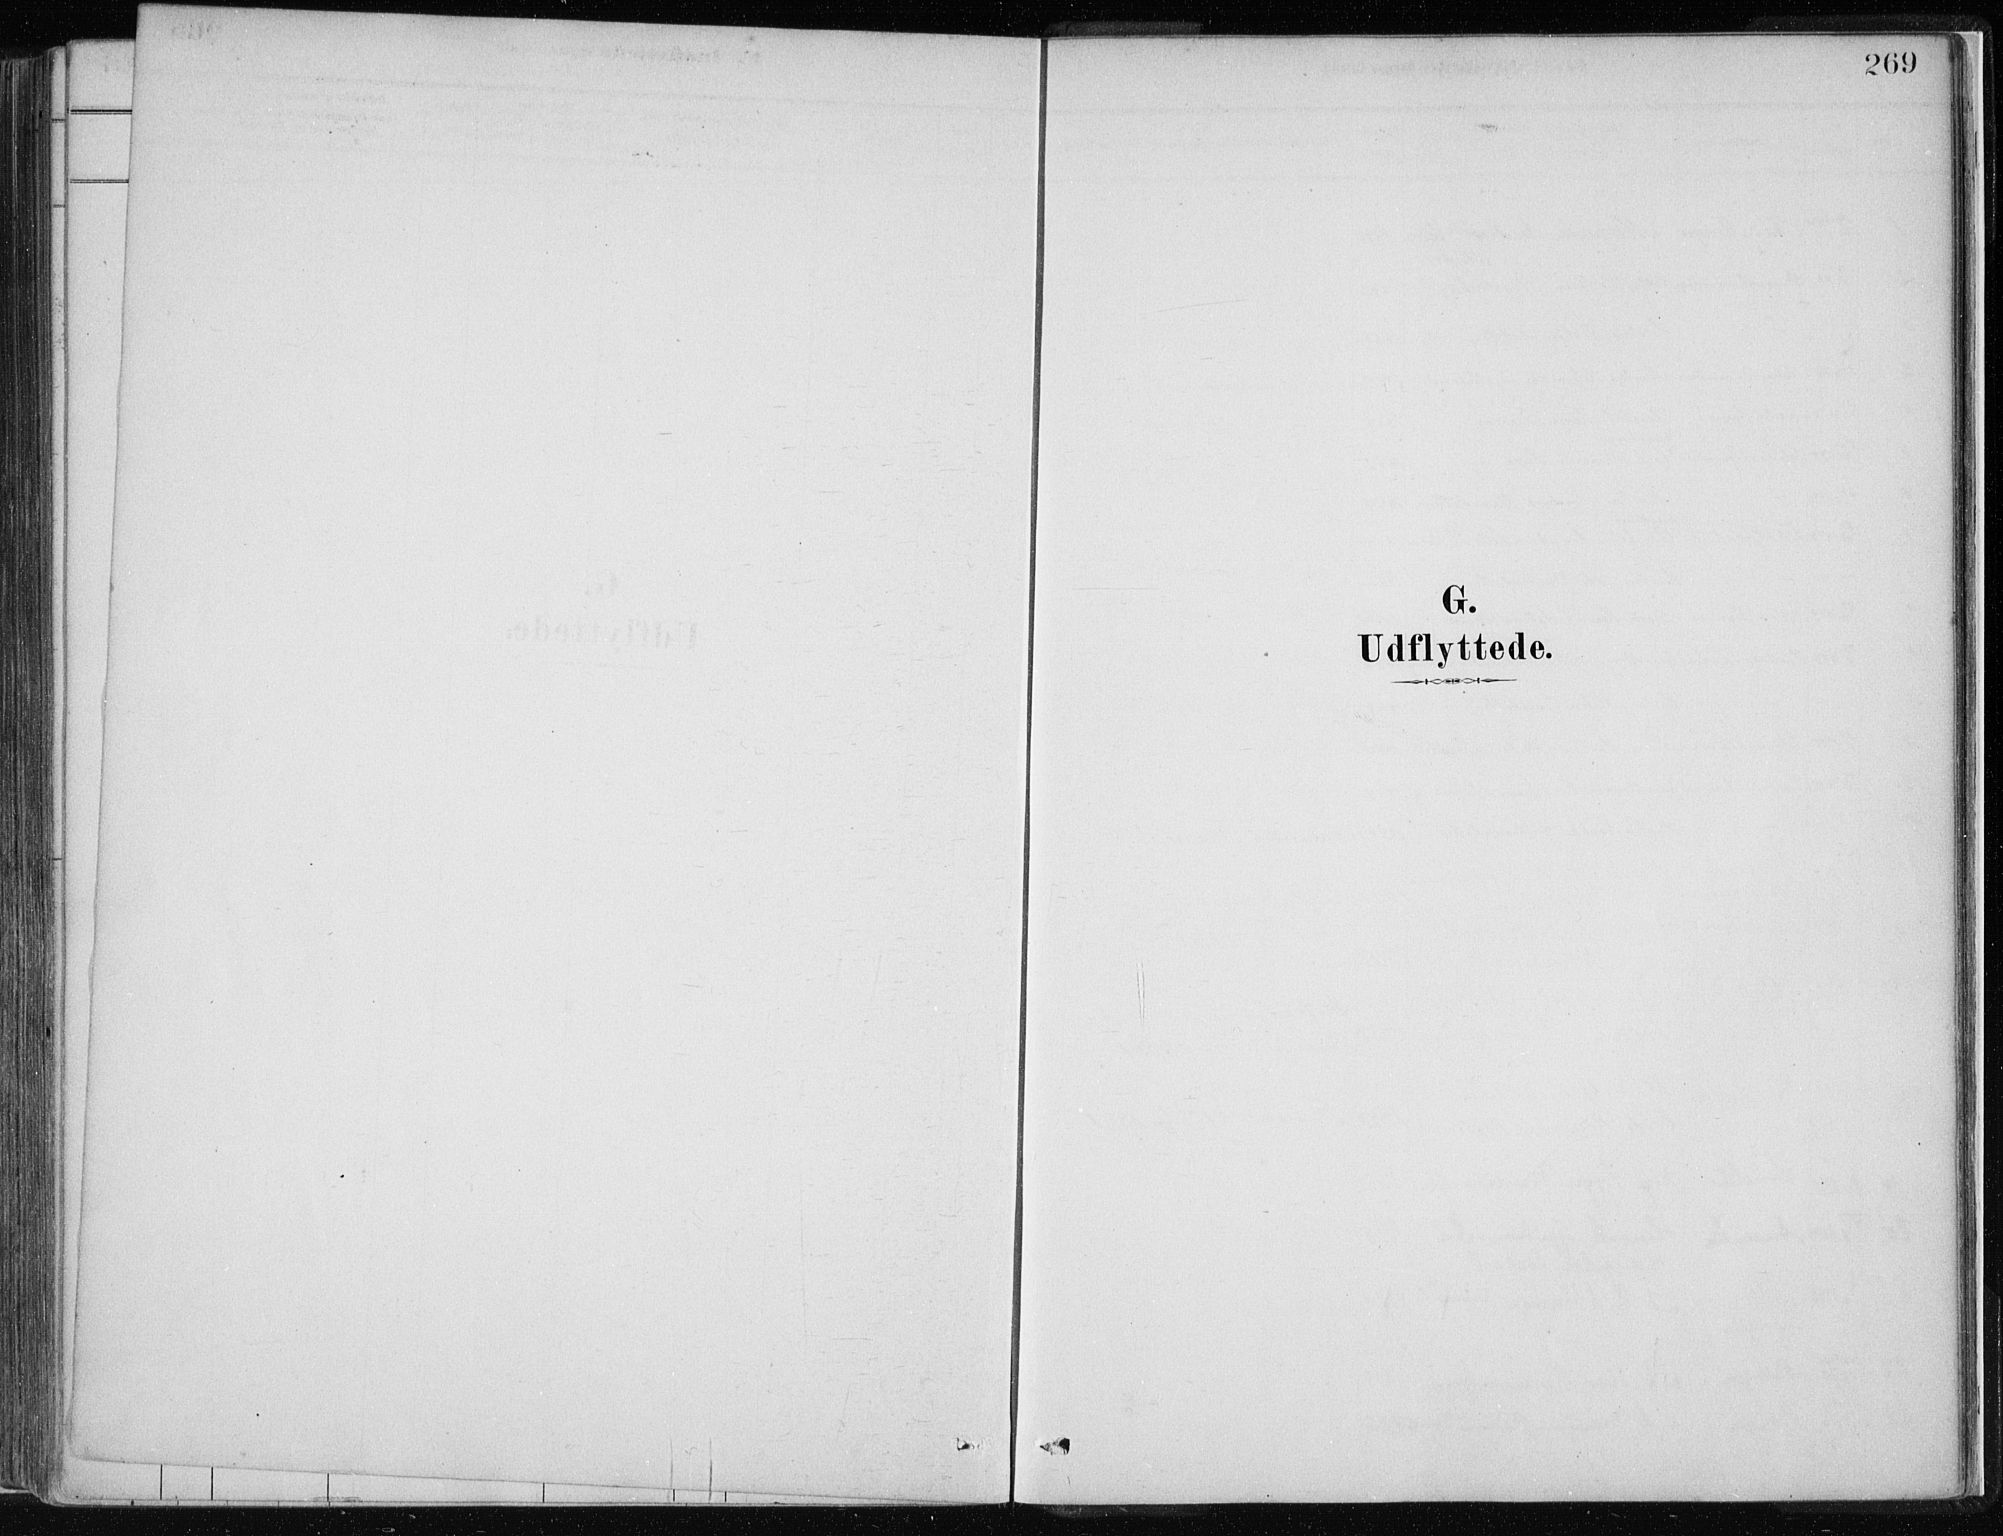 SAB, Masfjorden Soknepresembete, Ministerialbok nr. B  1, 1876-1899, s. 269